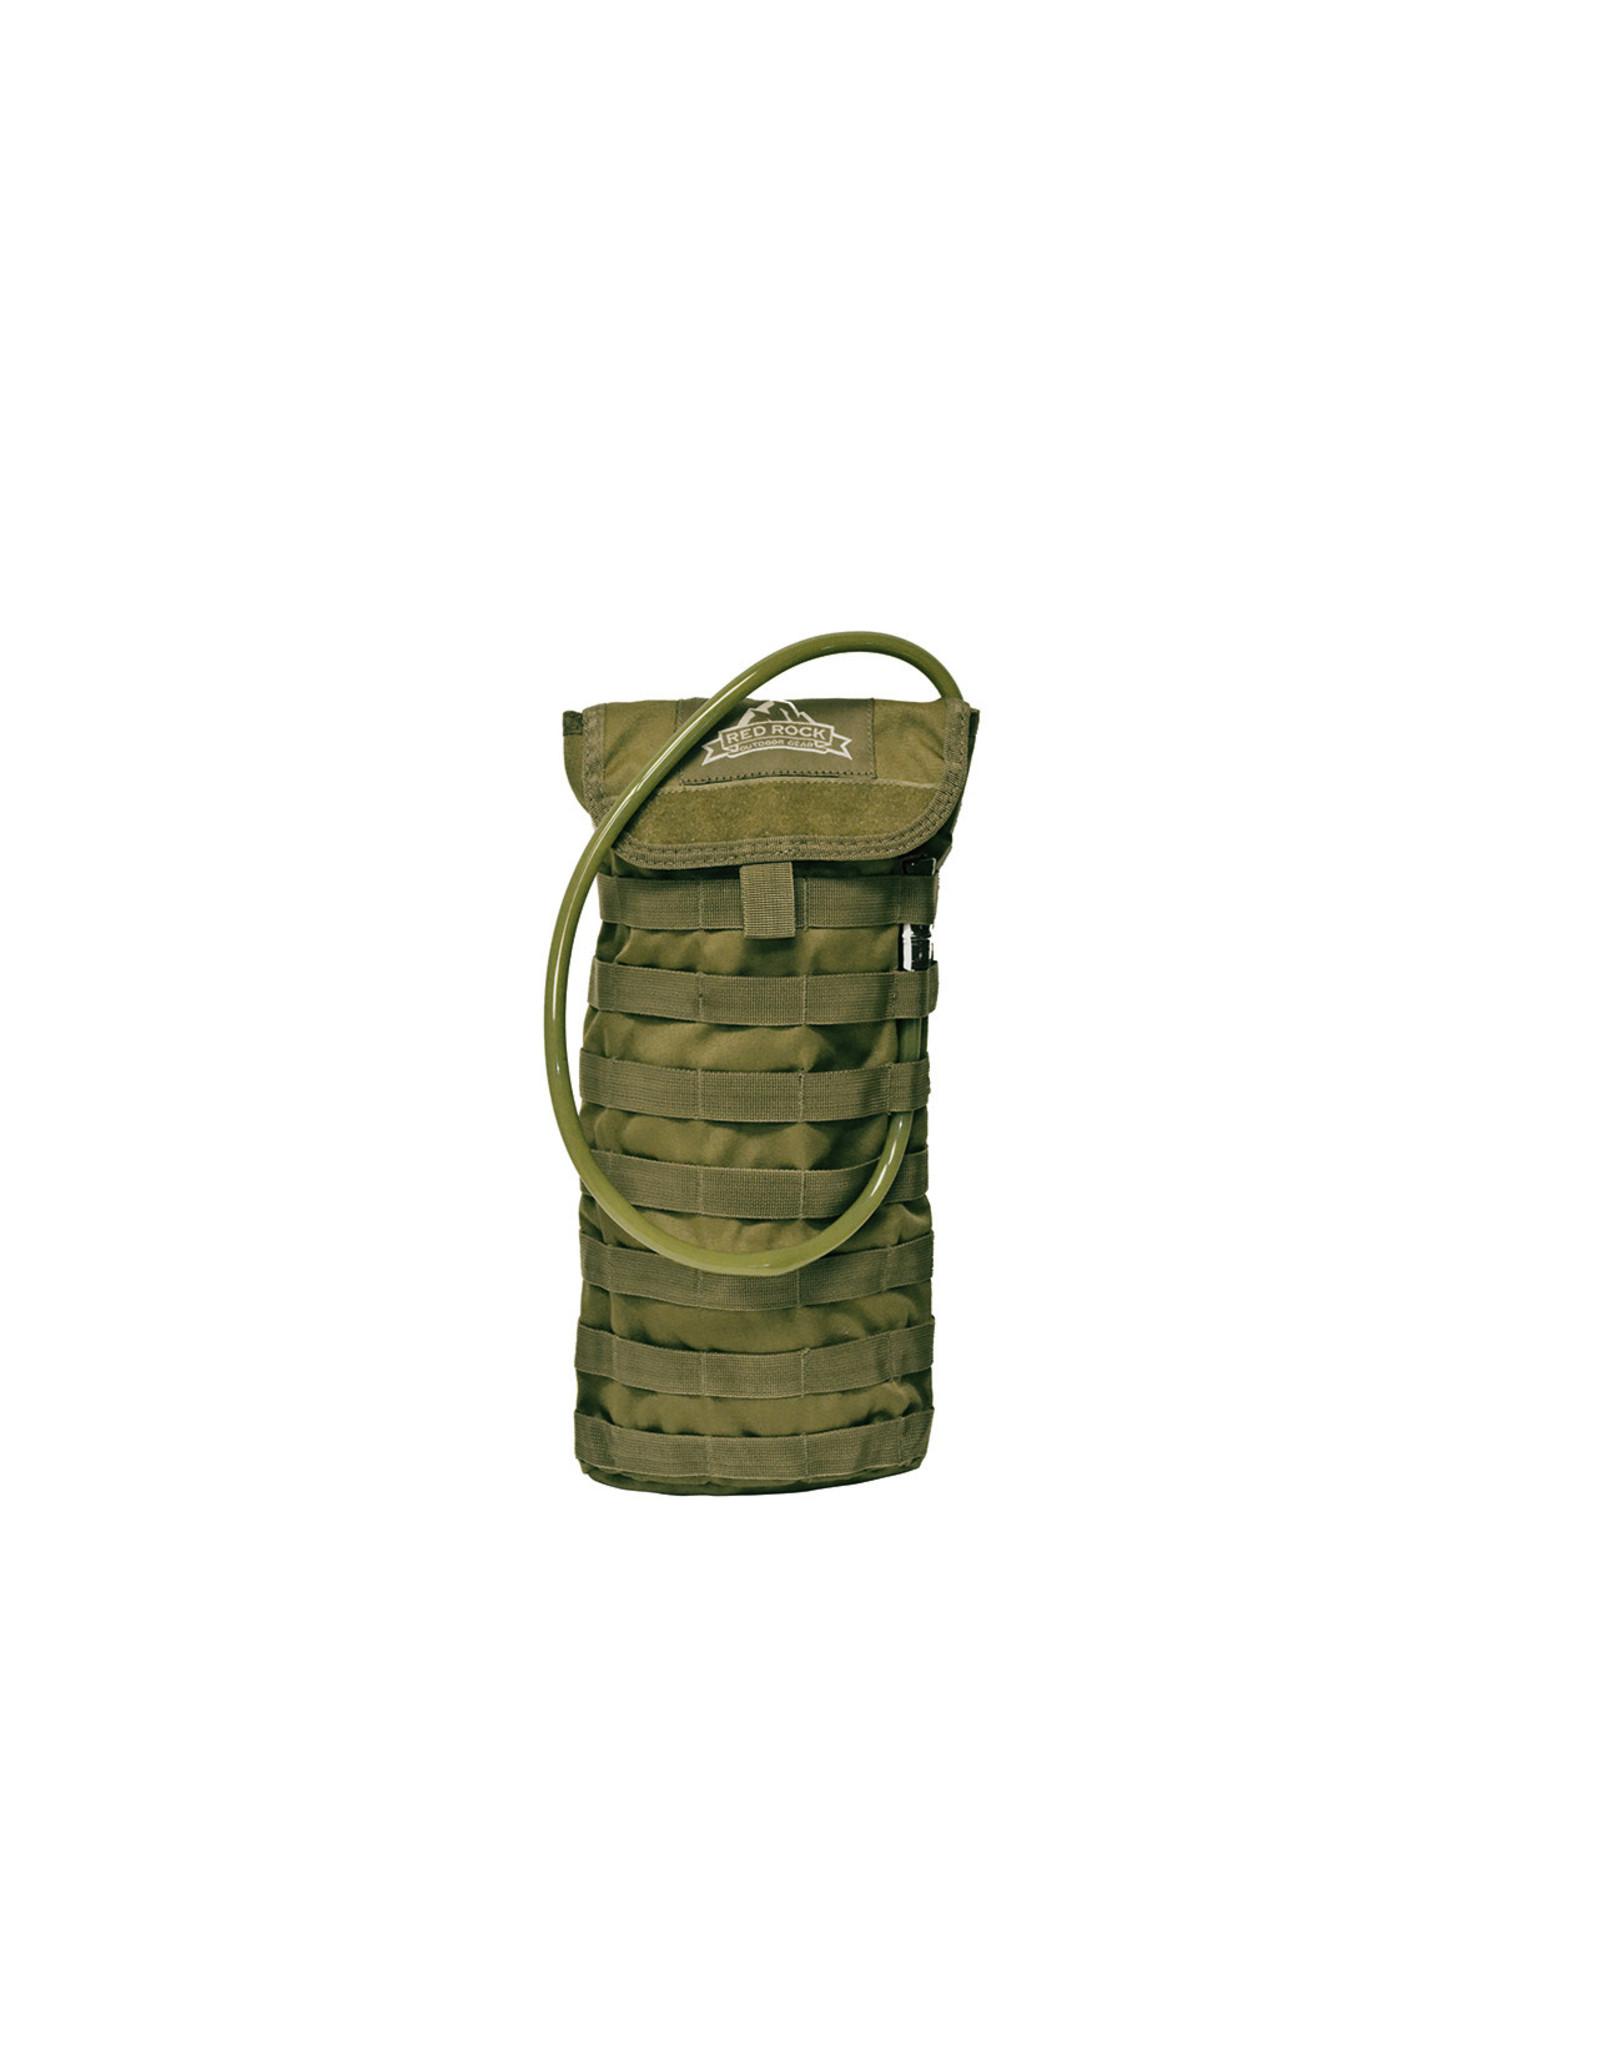 Red Rock Outdoor Gear Modular Hydration Carrier Pouch